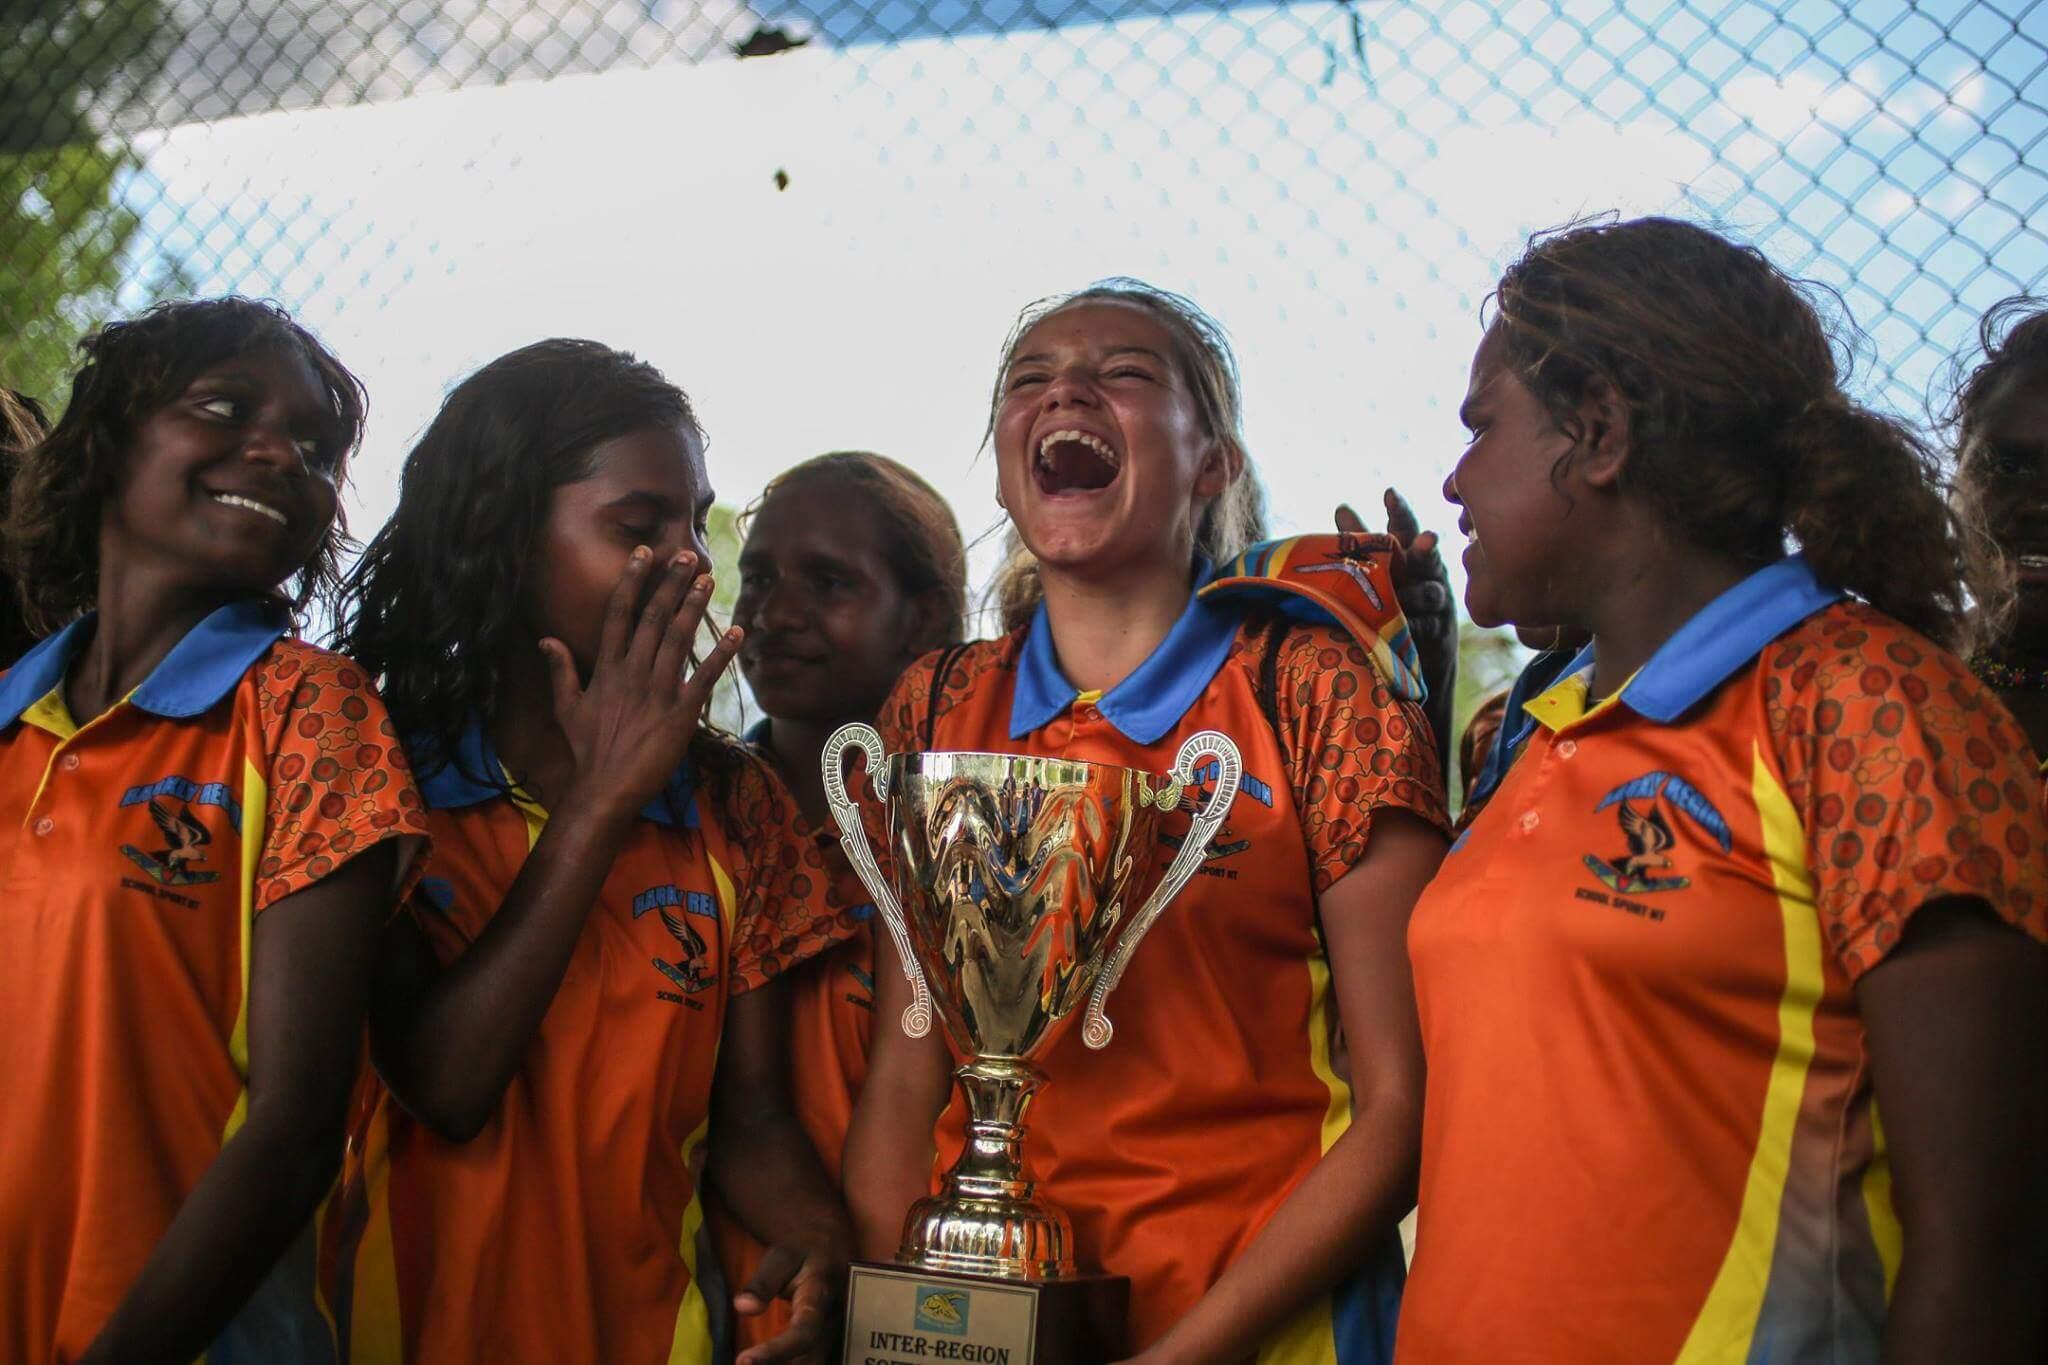 Team championship win smiling portrait